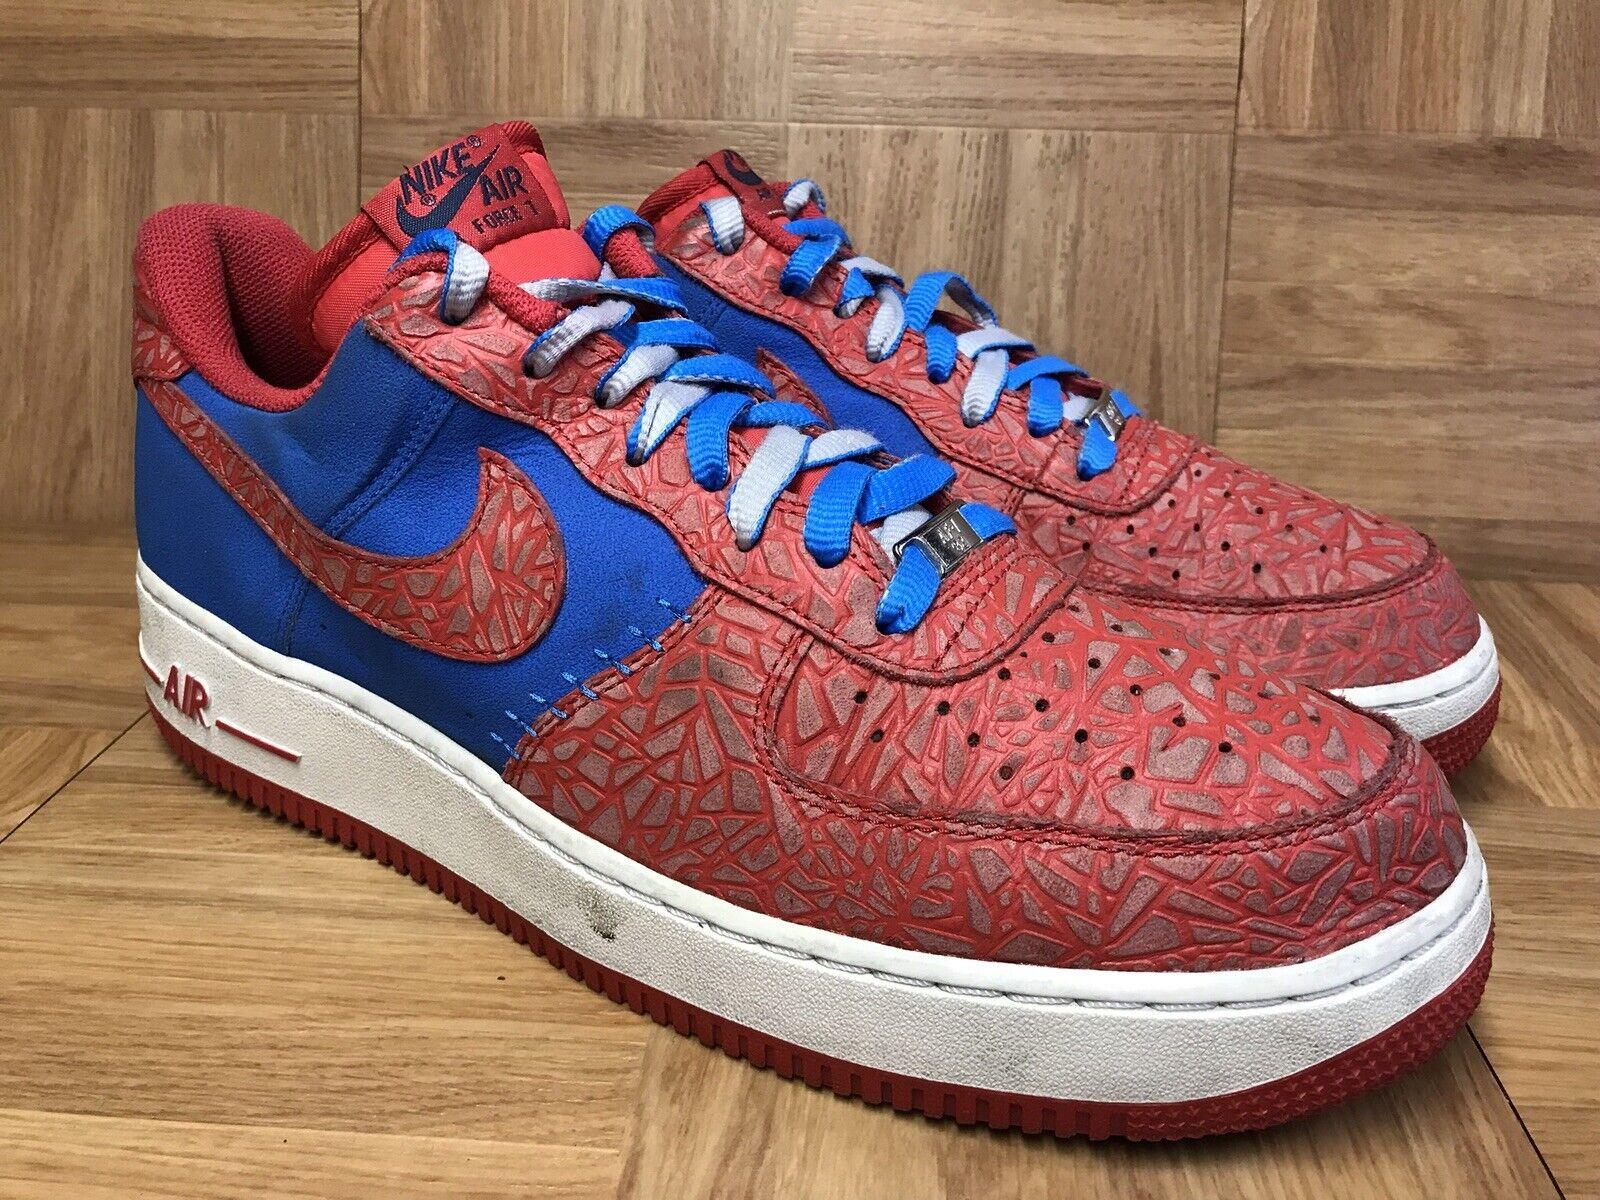 RARE Nike Air Force One 1 Low Photo bluee Hyper Red SPlDERMAN Sz 12 488298-412